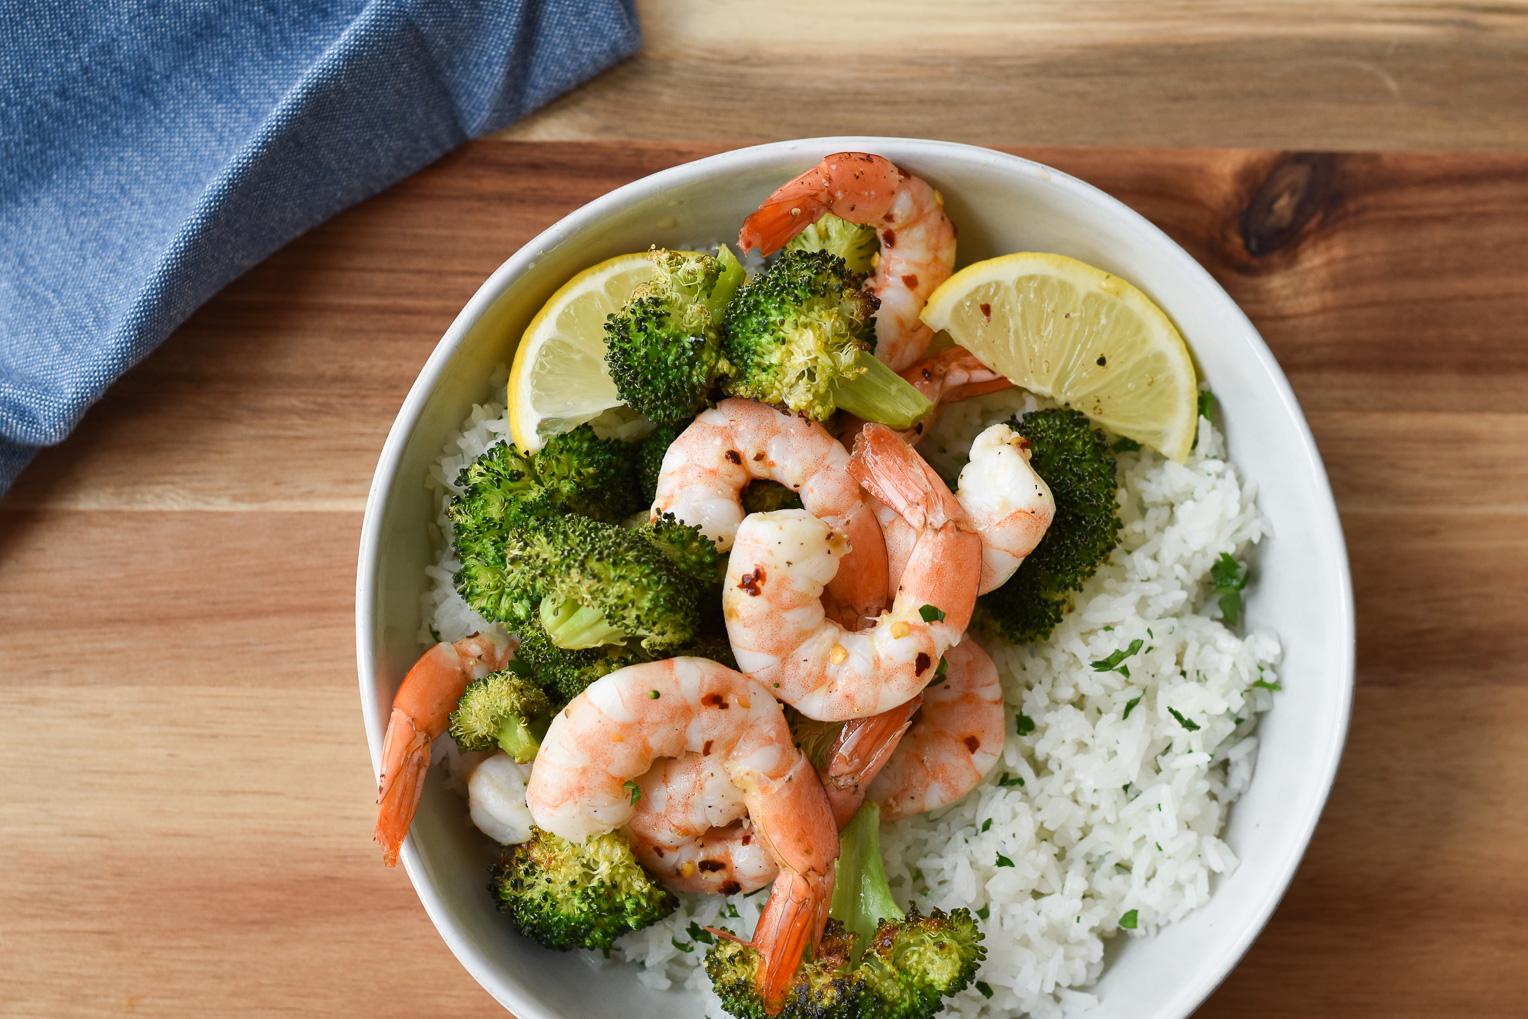 Lemon Roasted Shrimp with Broccoli and Rice